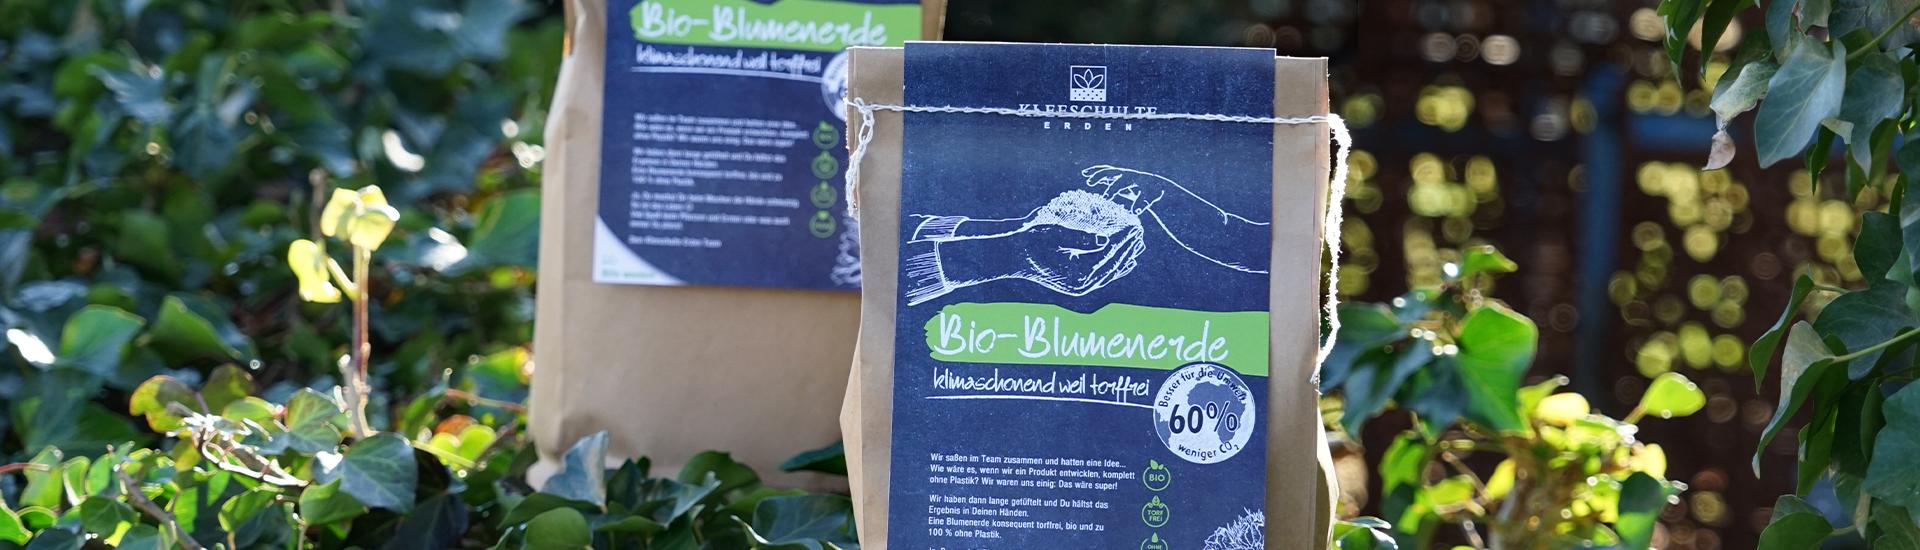 Sackabbildung vom Kleeschulte Paper-Bag